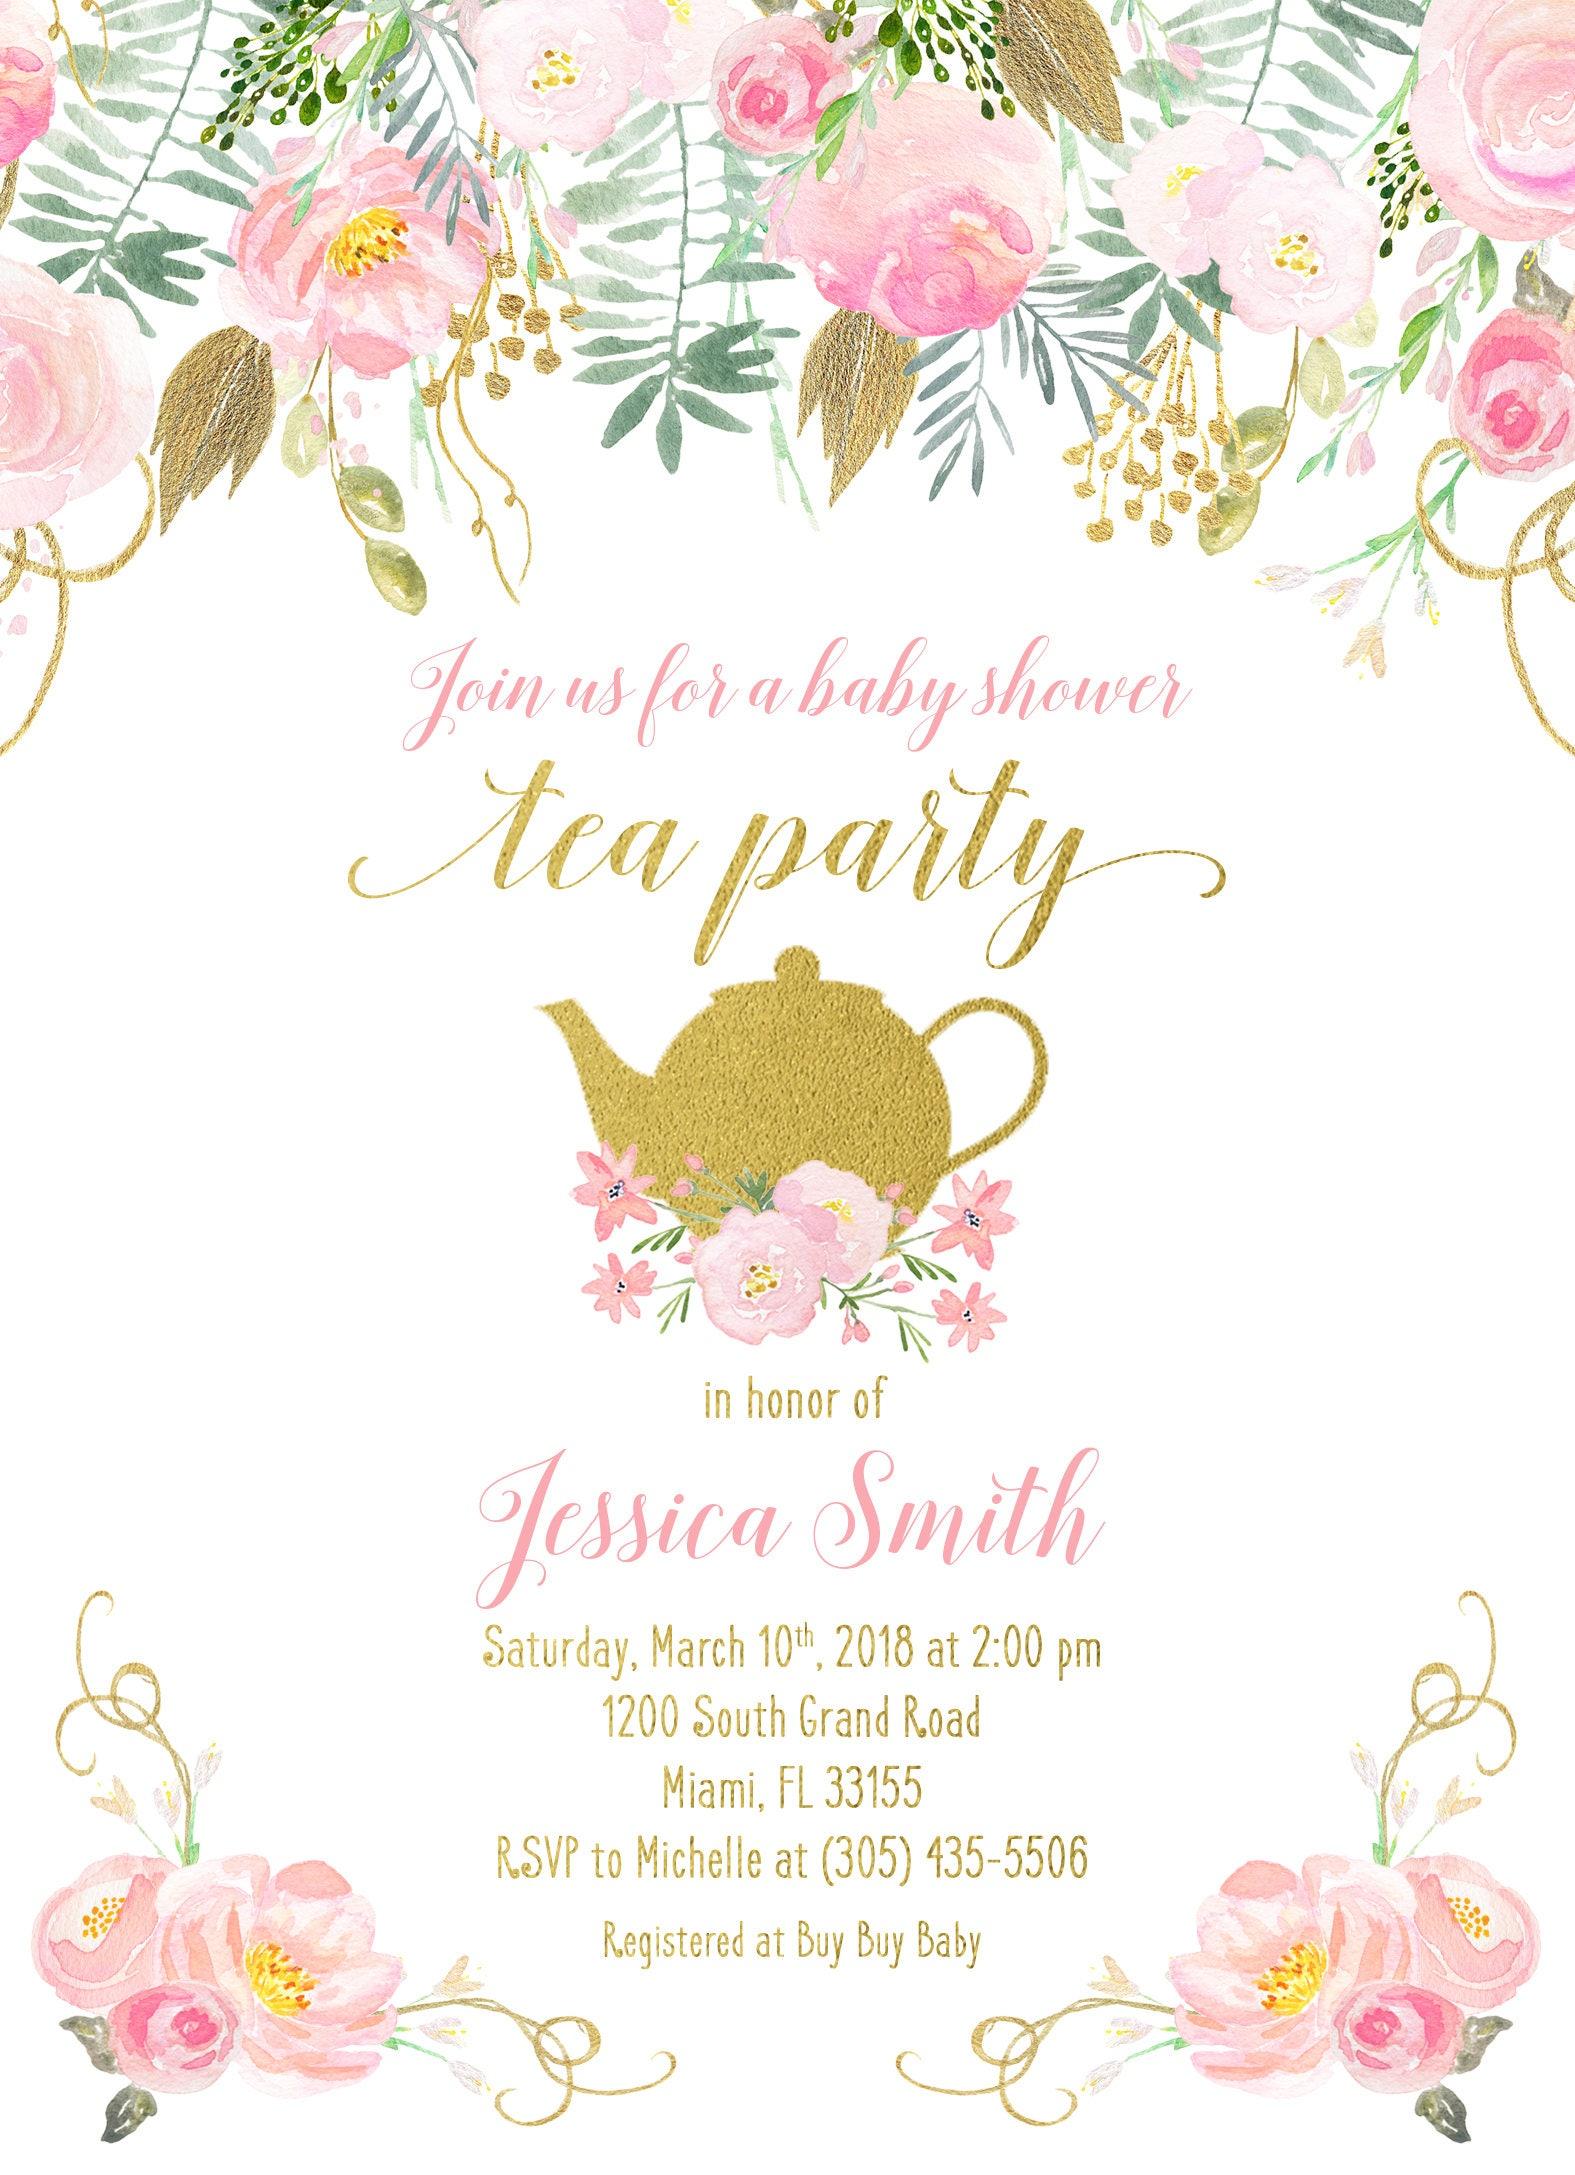 Tea Party Baby Shower Invitation, Tea Party Invitation, Baby Shower ...